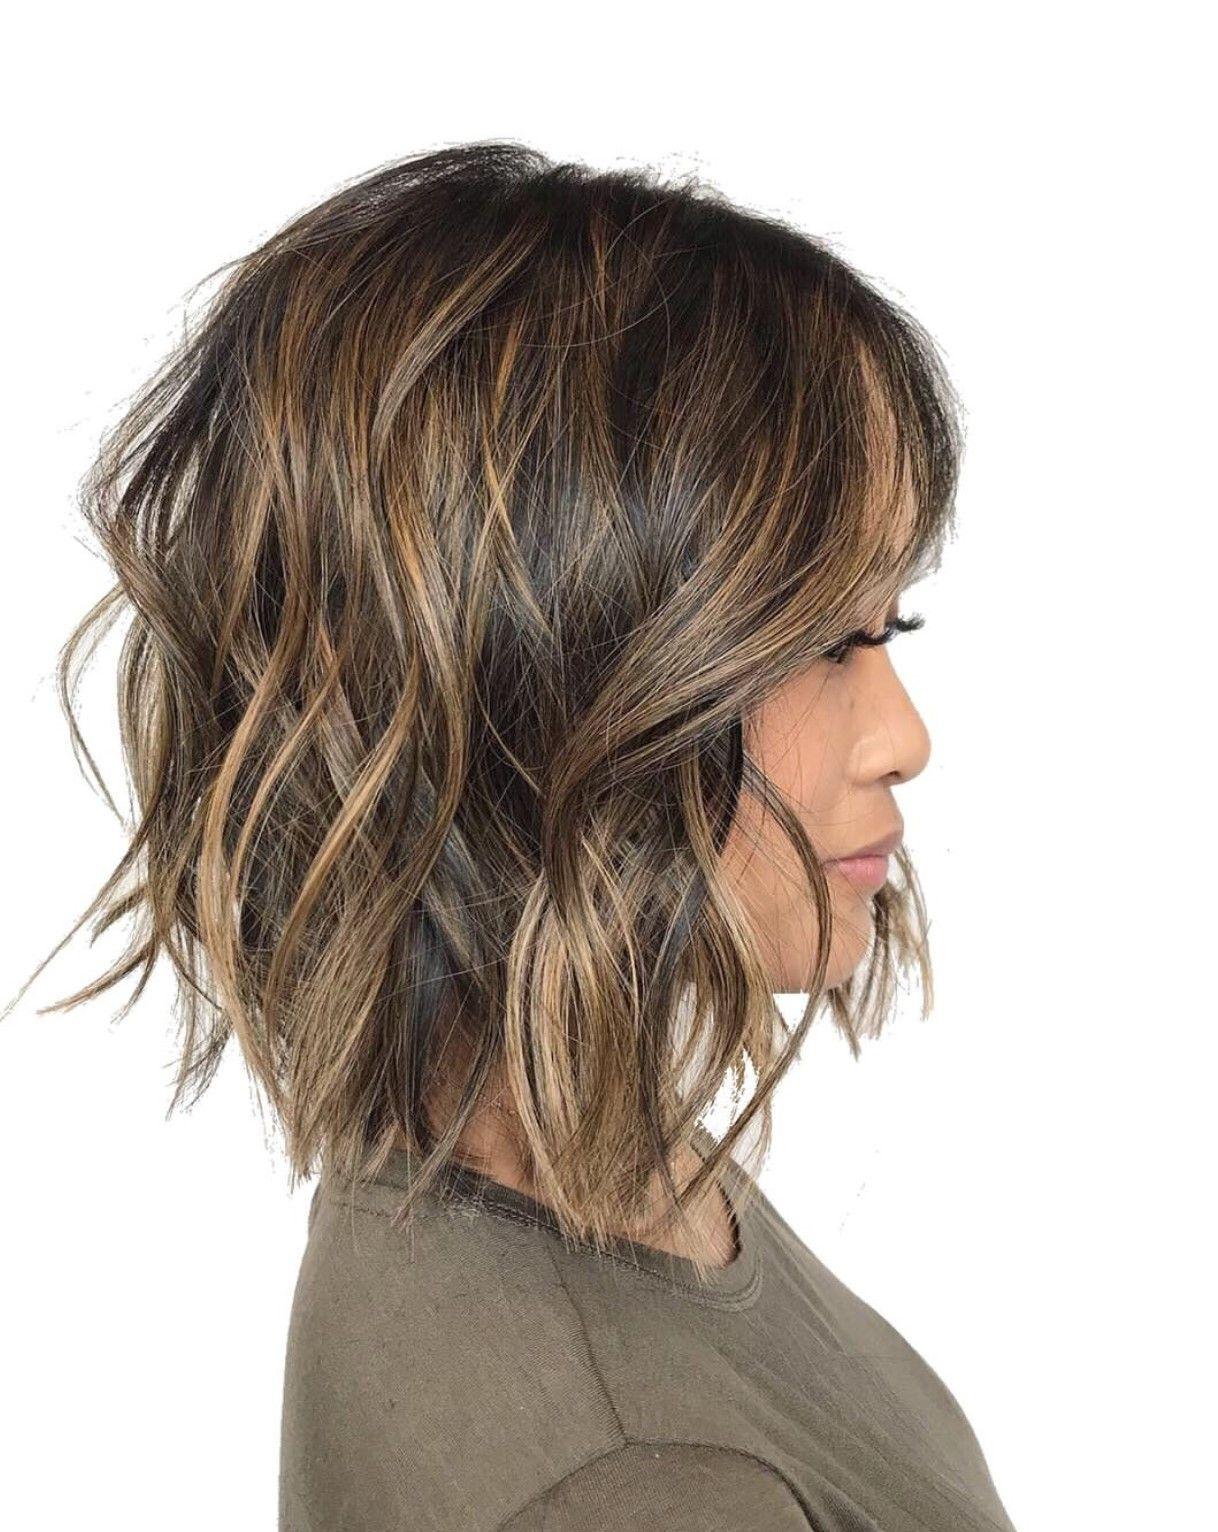 Iles Formula Hair Tips & Tricks: How to Care for Balayage Hair at home | Iles Formula